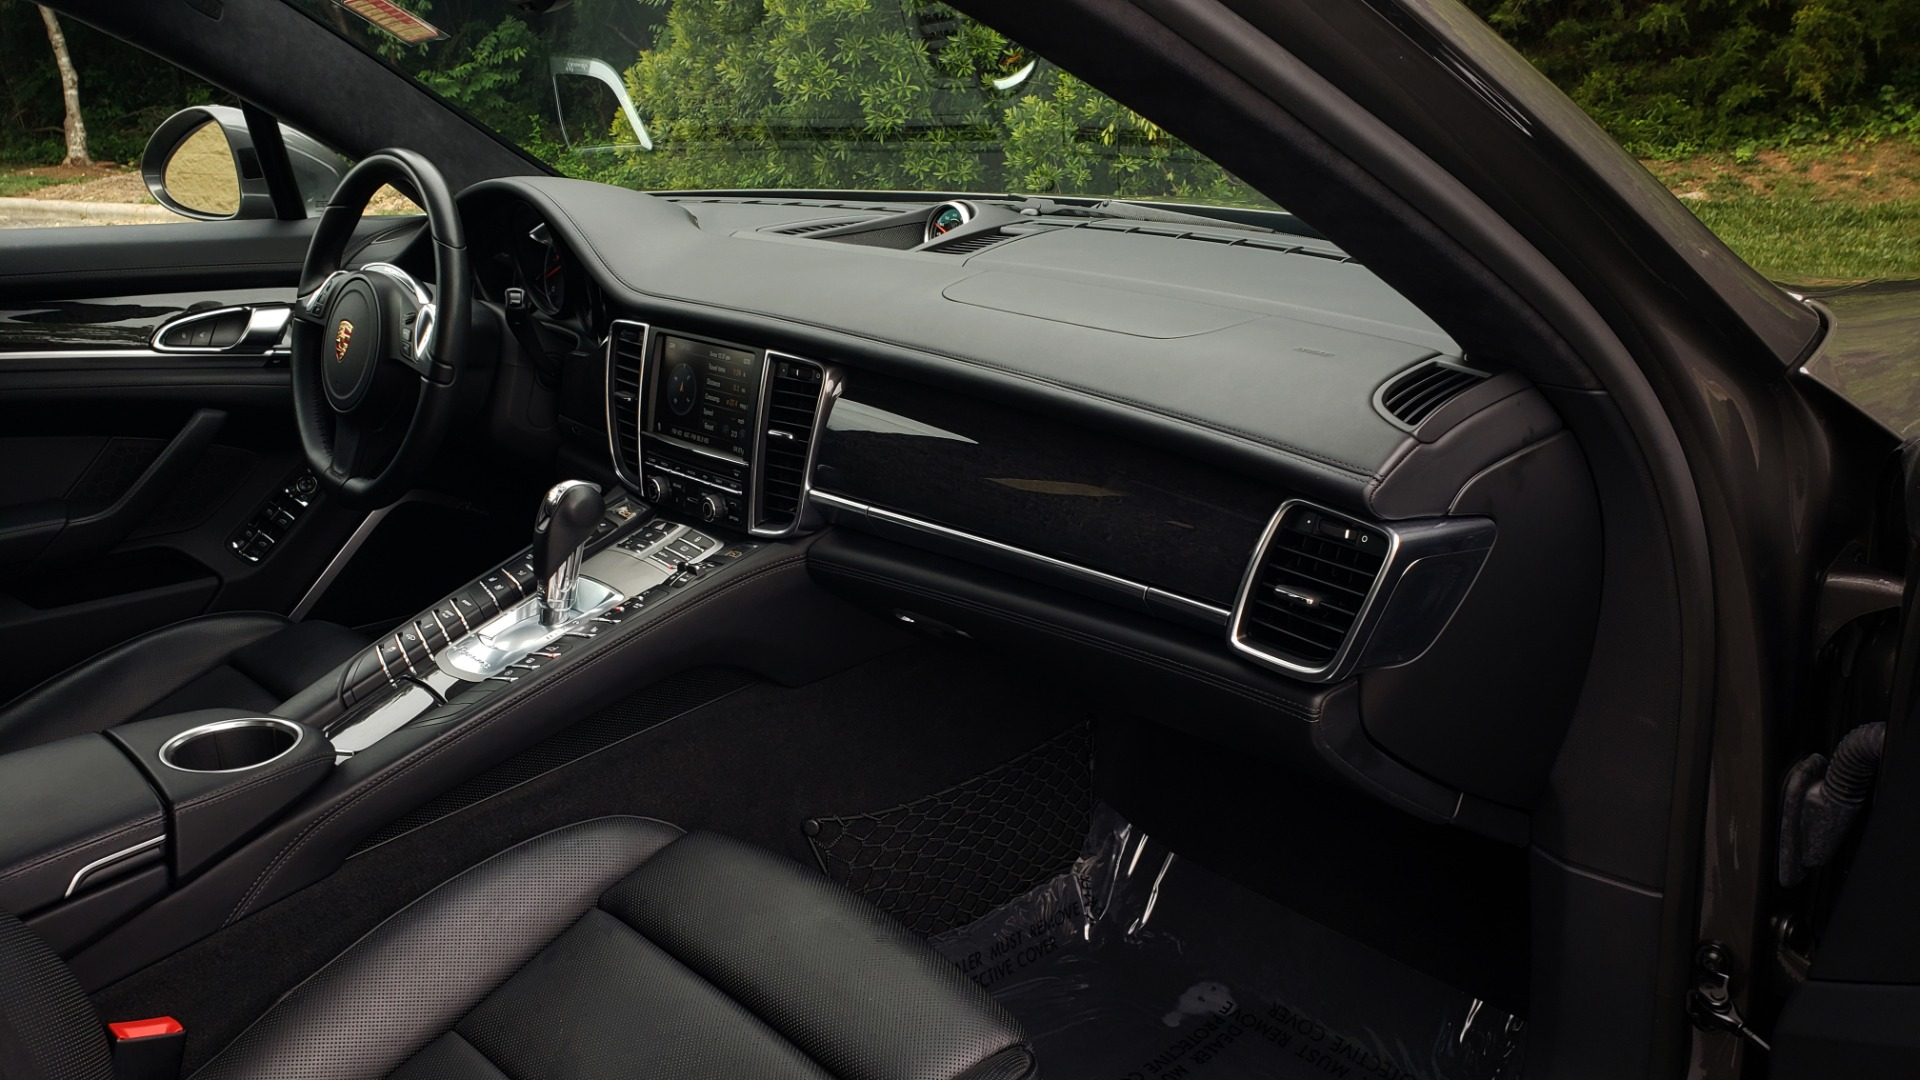 Used 2013 Porsche PANAMERA TURBO 4.8L V8 / AWD / NAV / SUNROOF / LCA / PARK ASST / BURMESTER for sale $45,995 at Formula Imports in Charlotte NC 28227 74